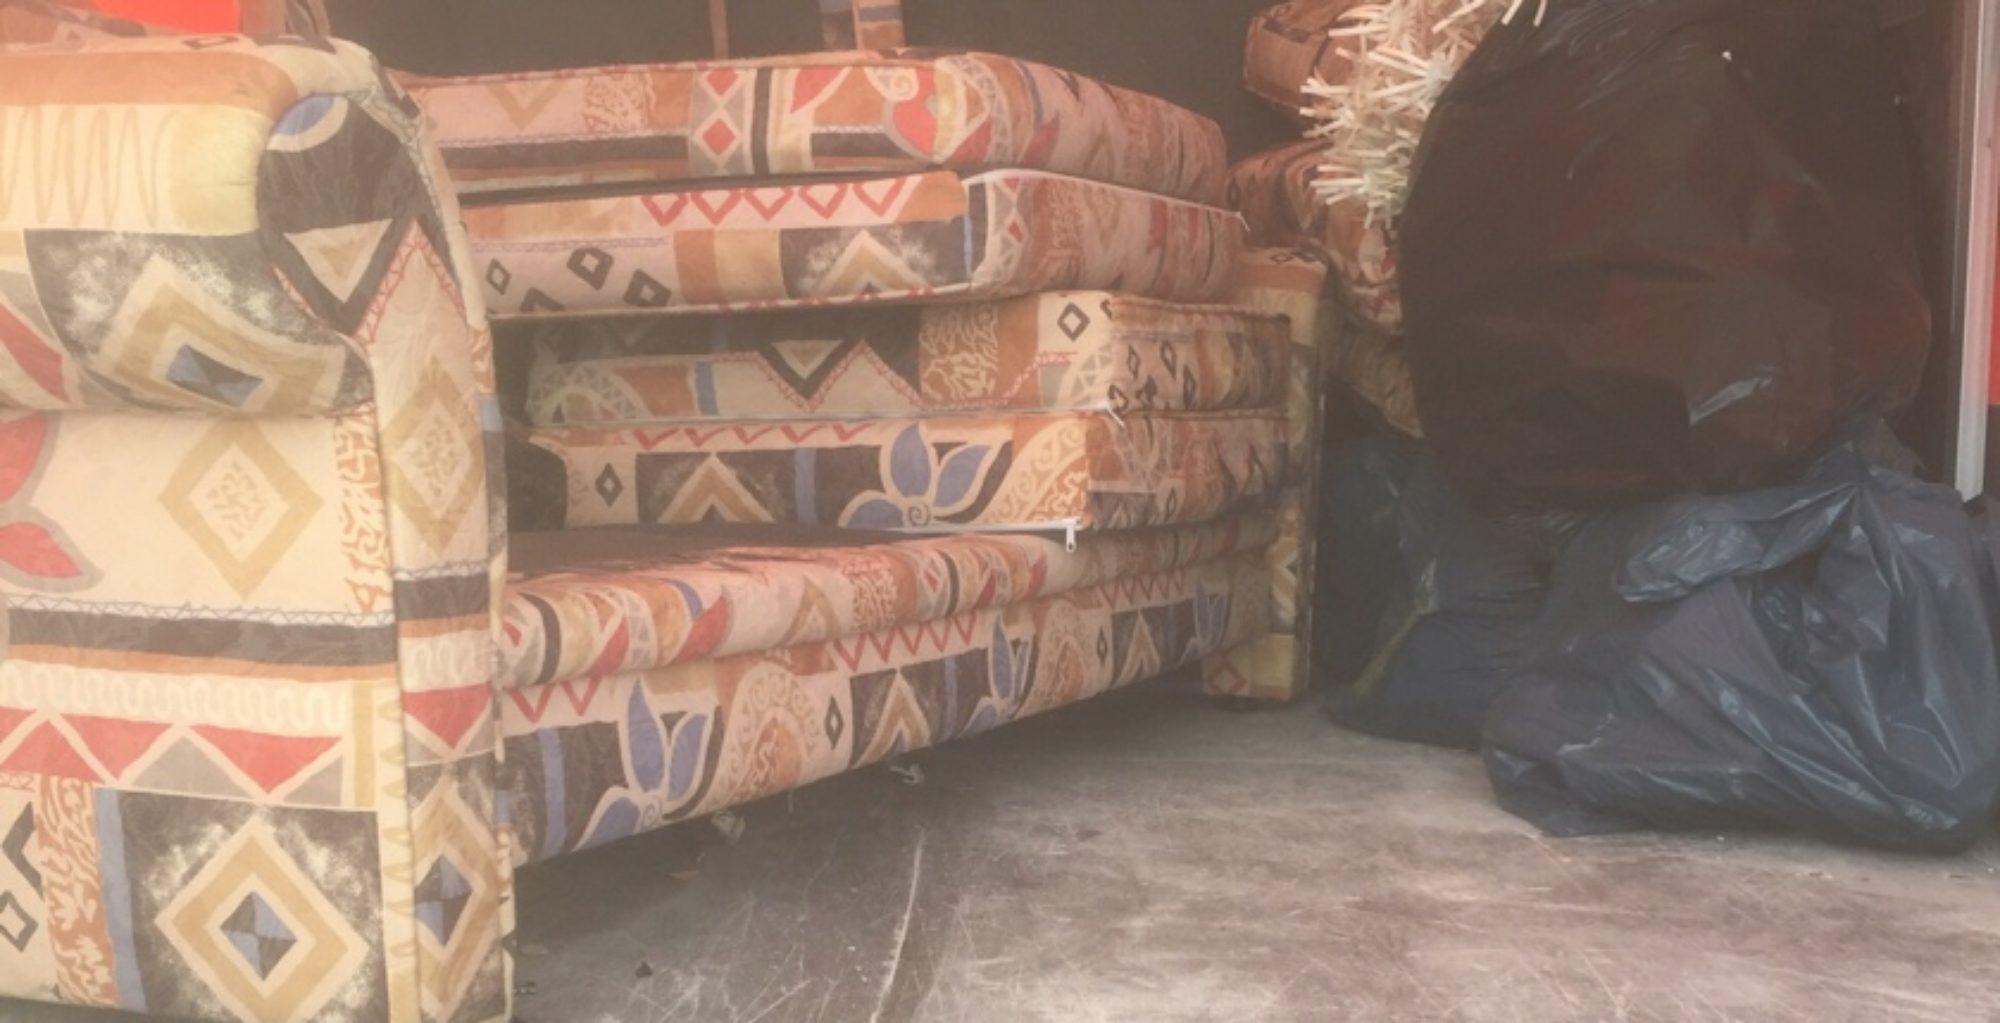 Möbel Ikea Sofa entsorgen Berlin pauschal 80 Euro